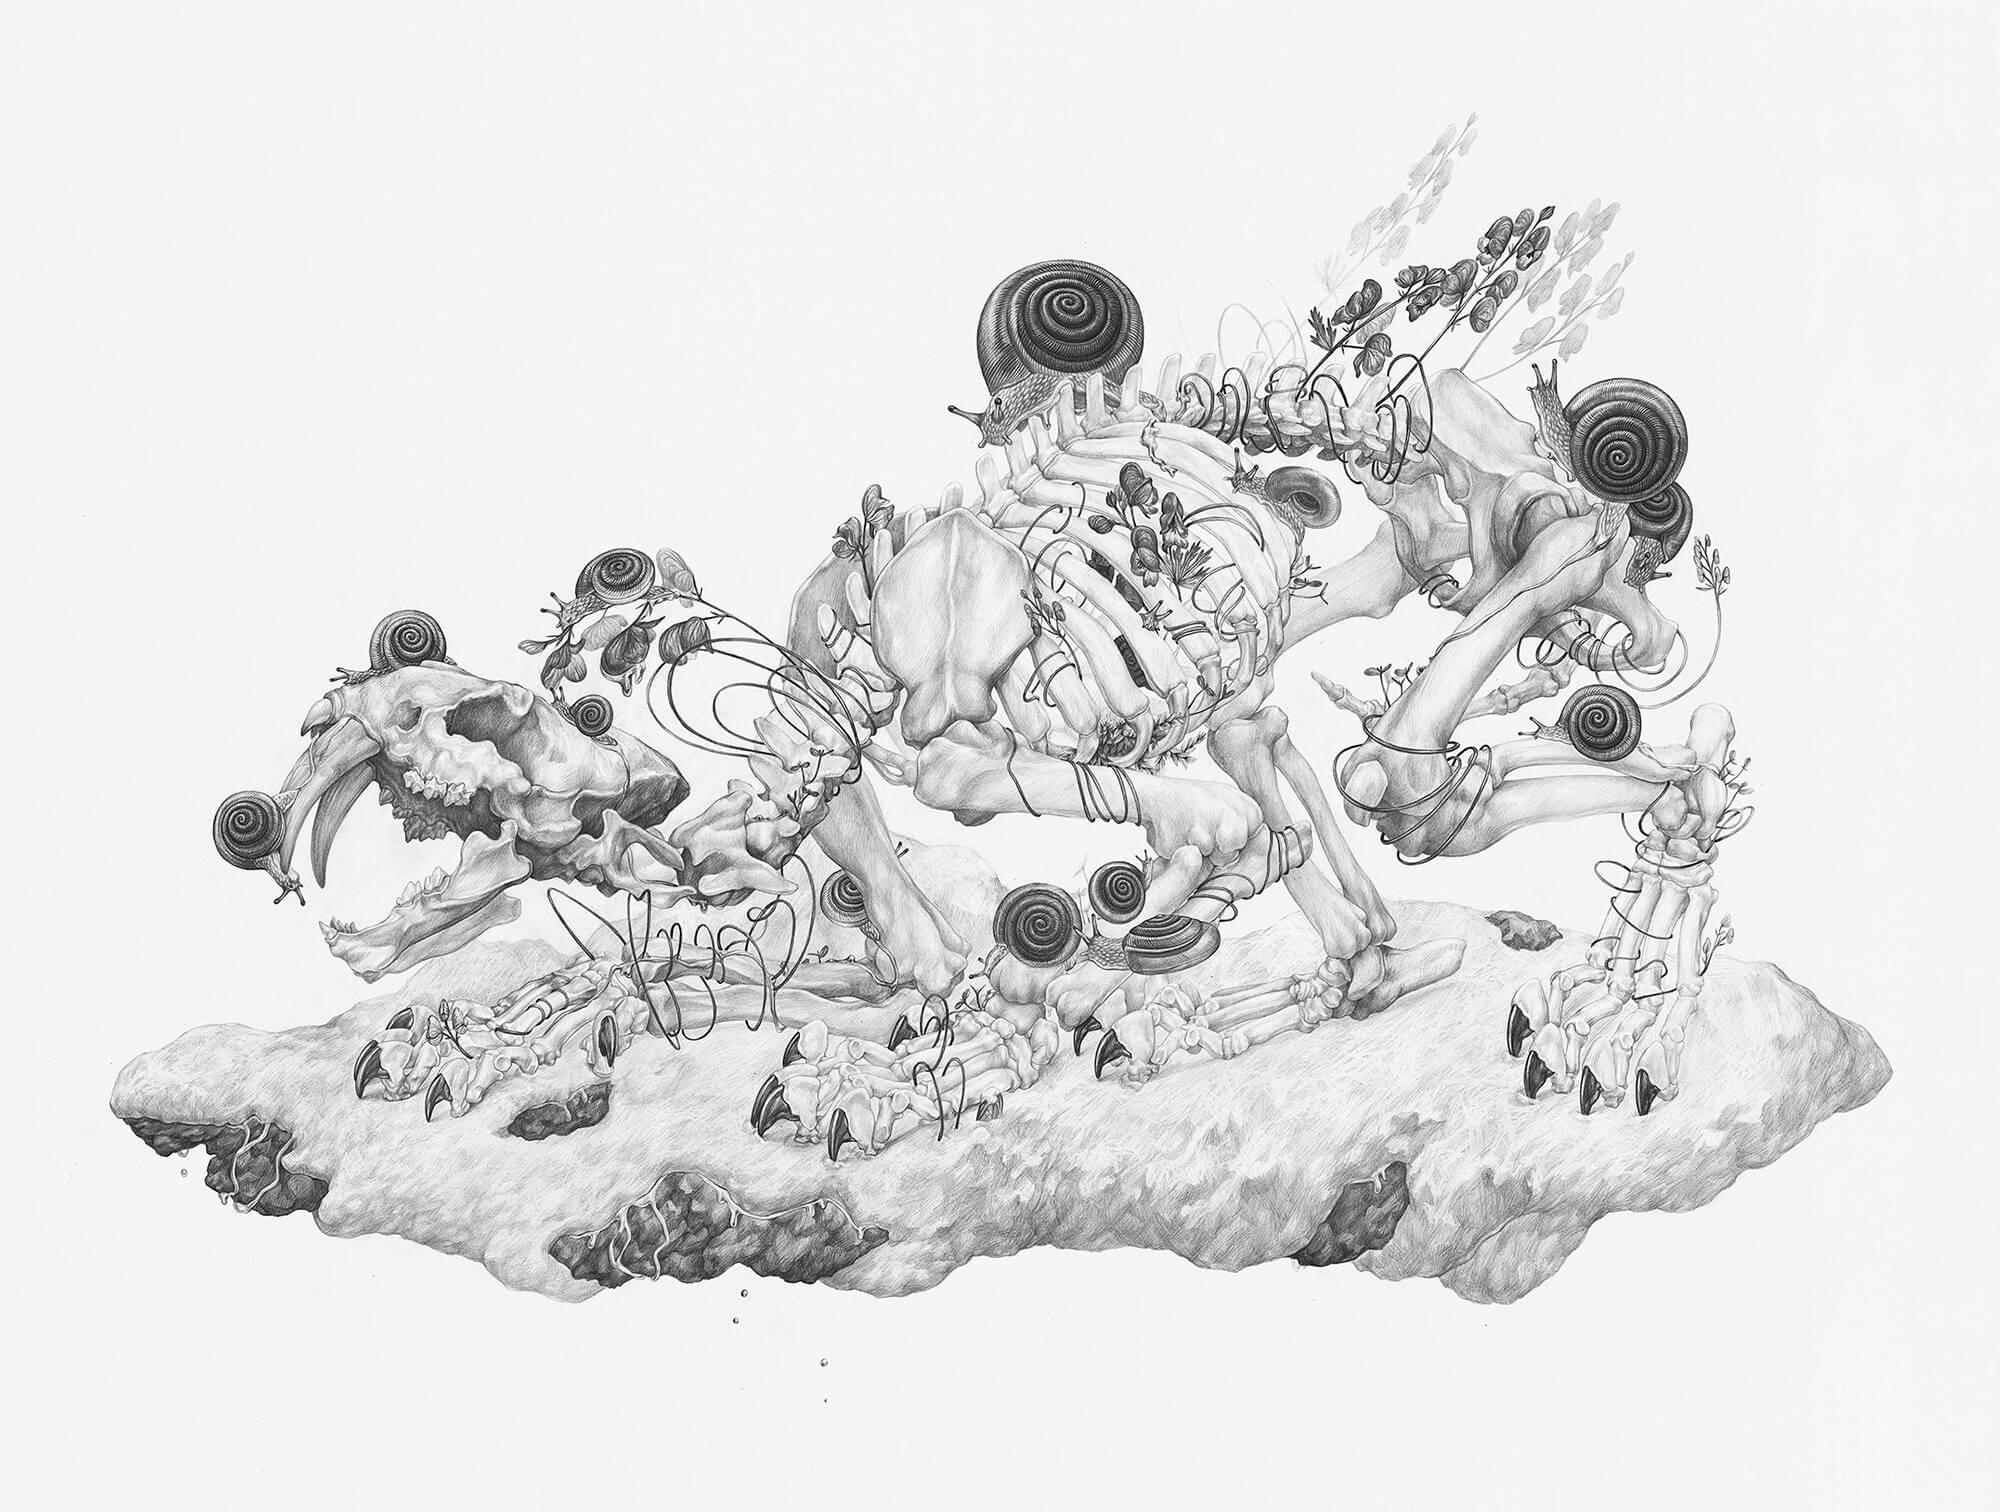 Skeleton and animal drawing